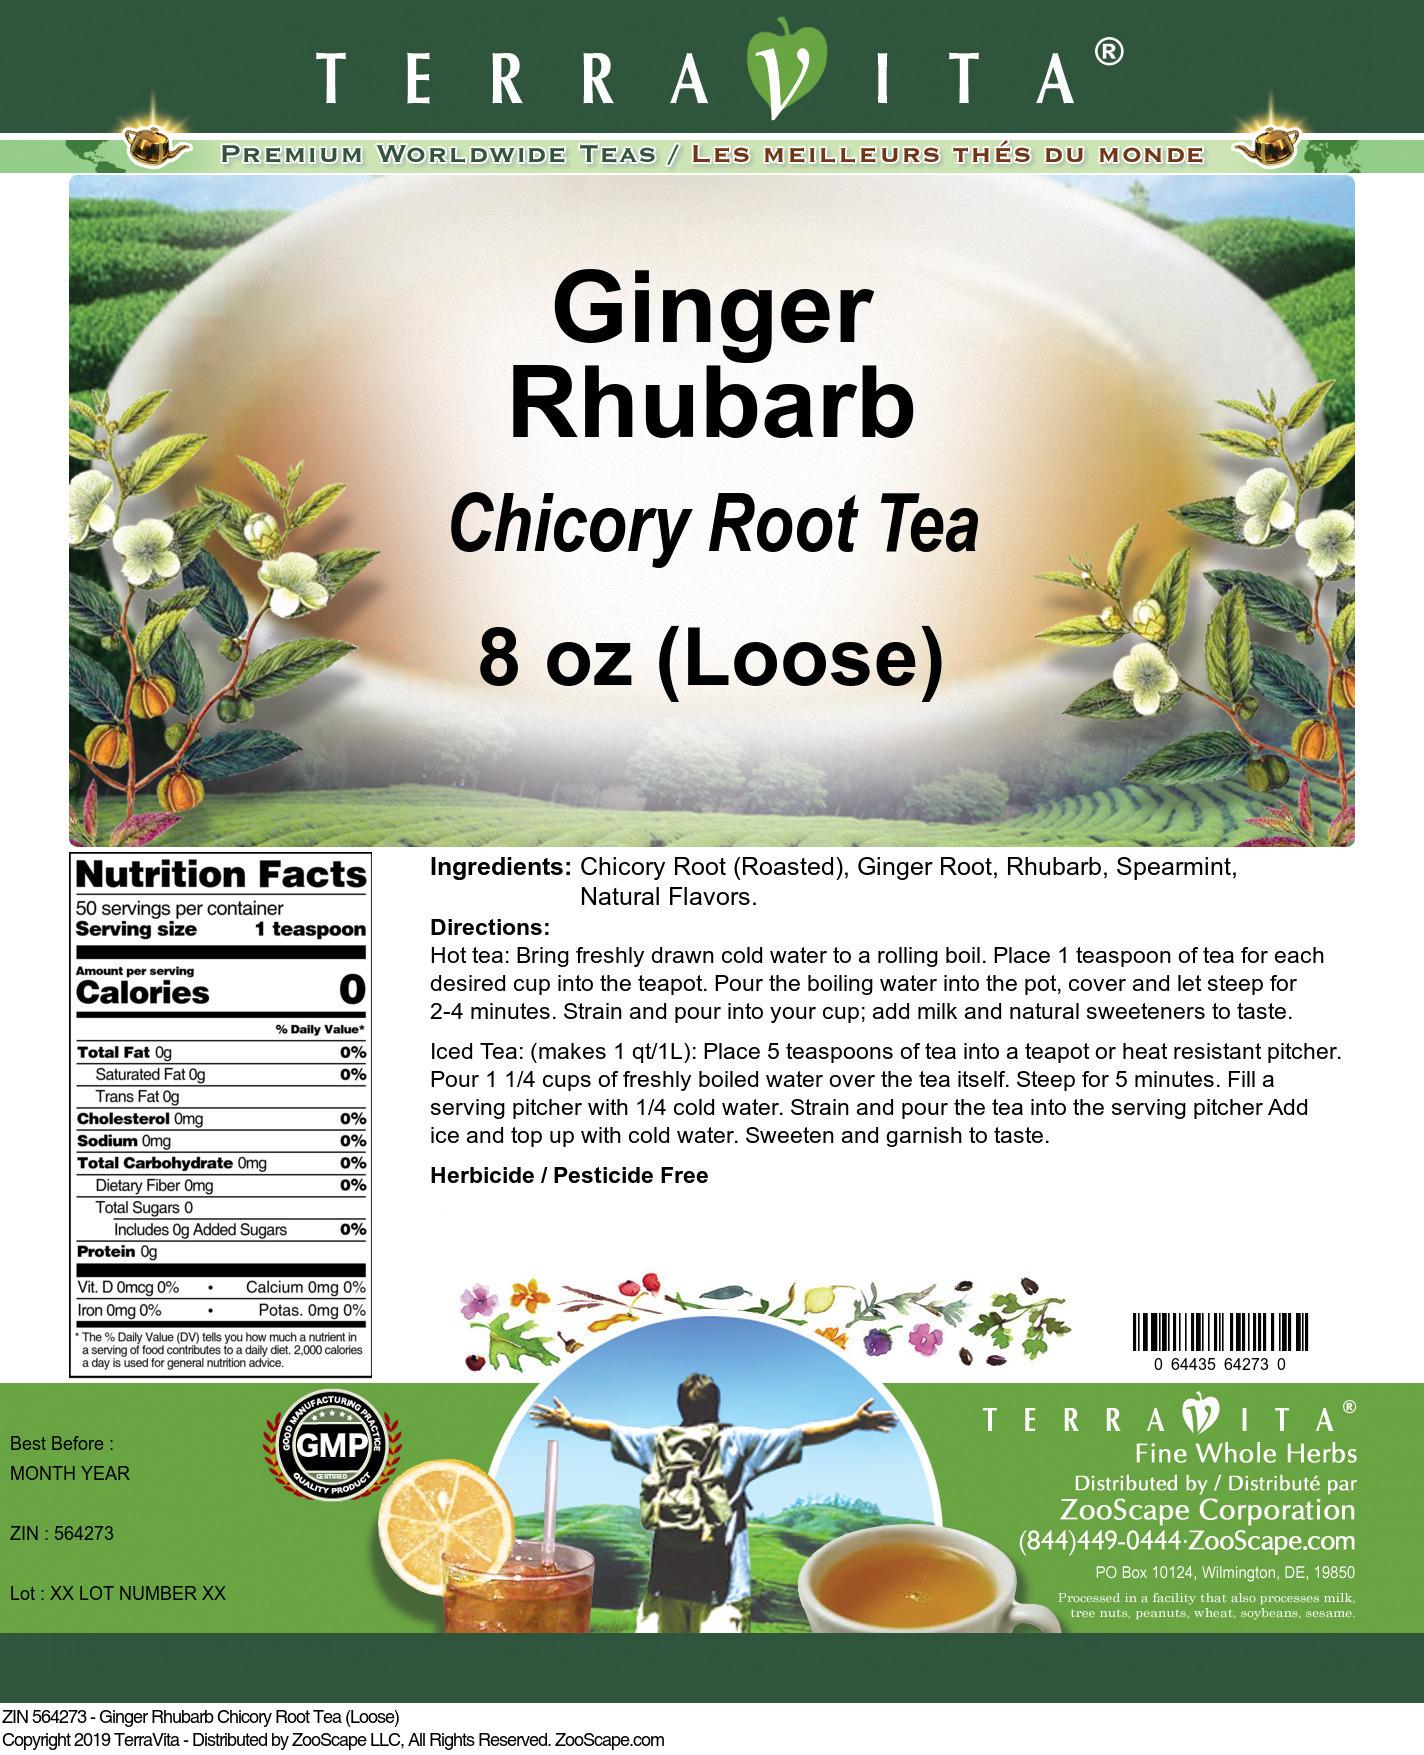 Ginger Rhubarb Chicory Root Tea (Loose)